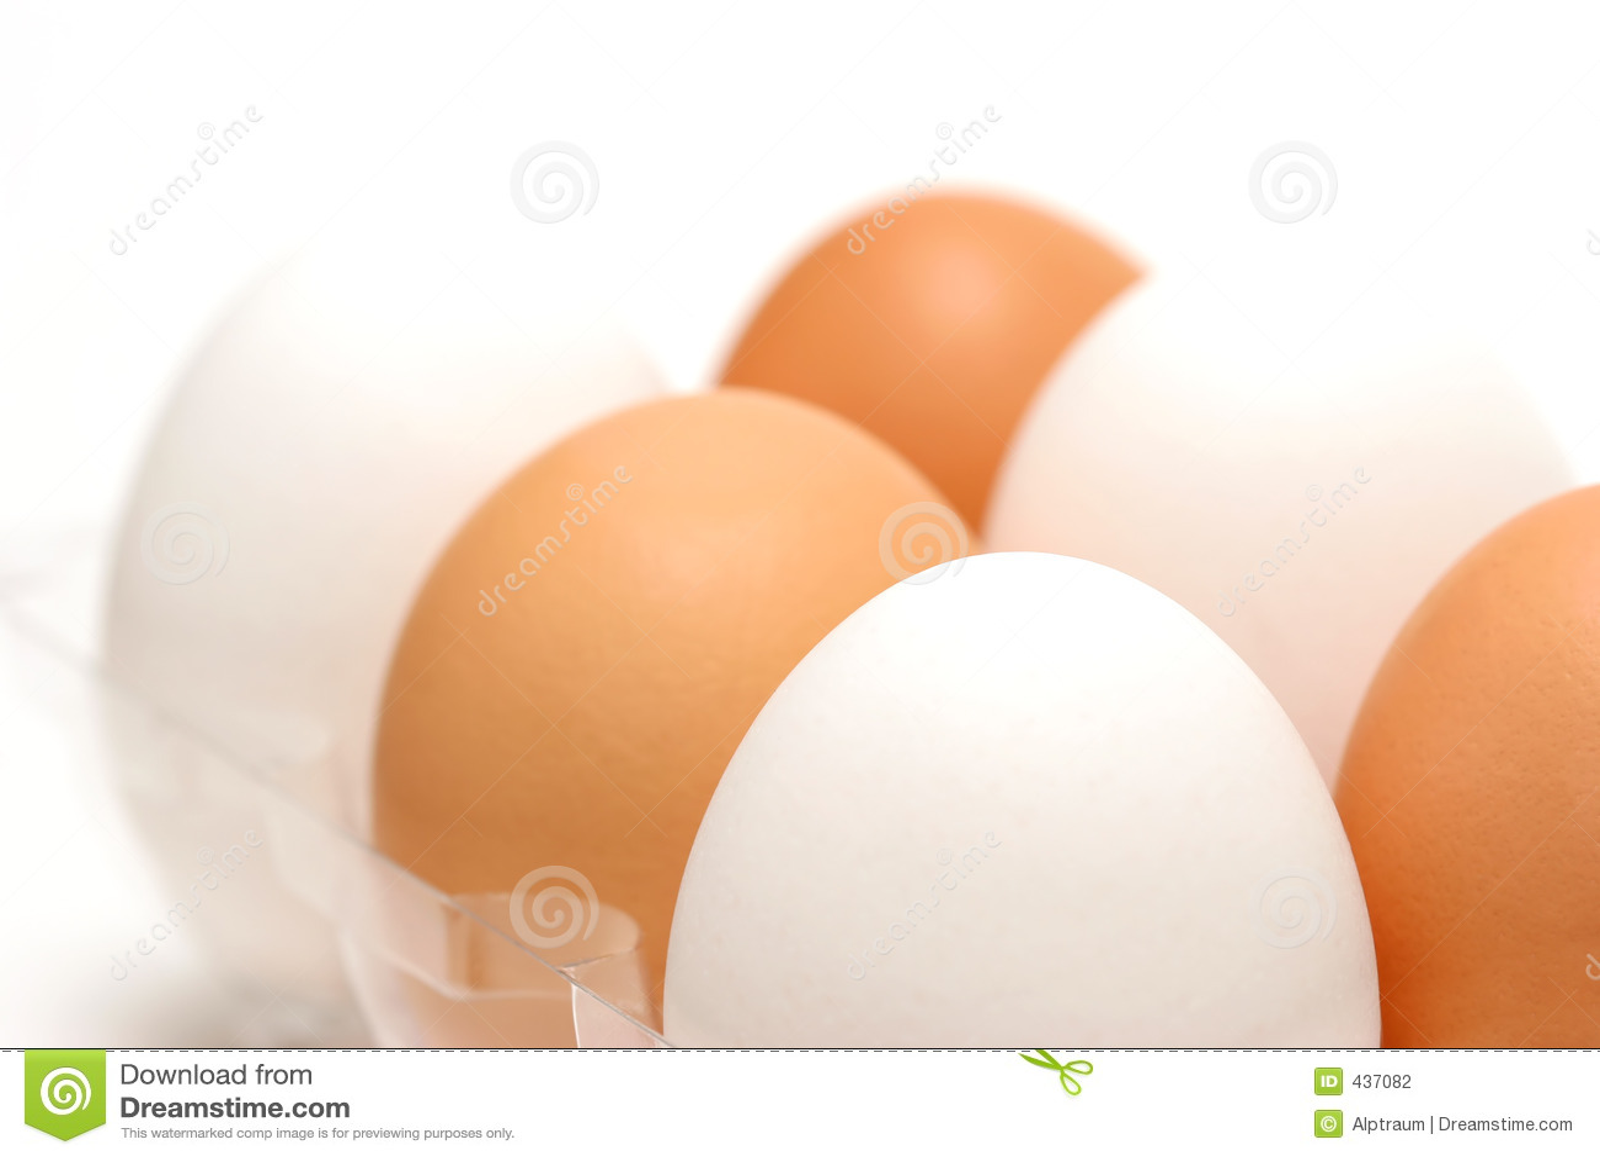 Eggs diversity